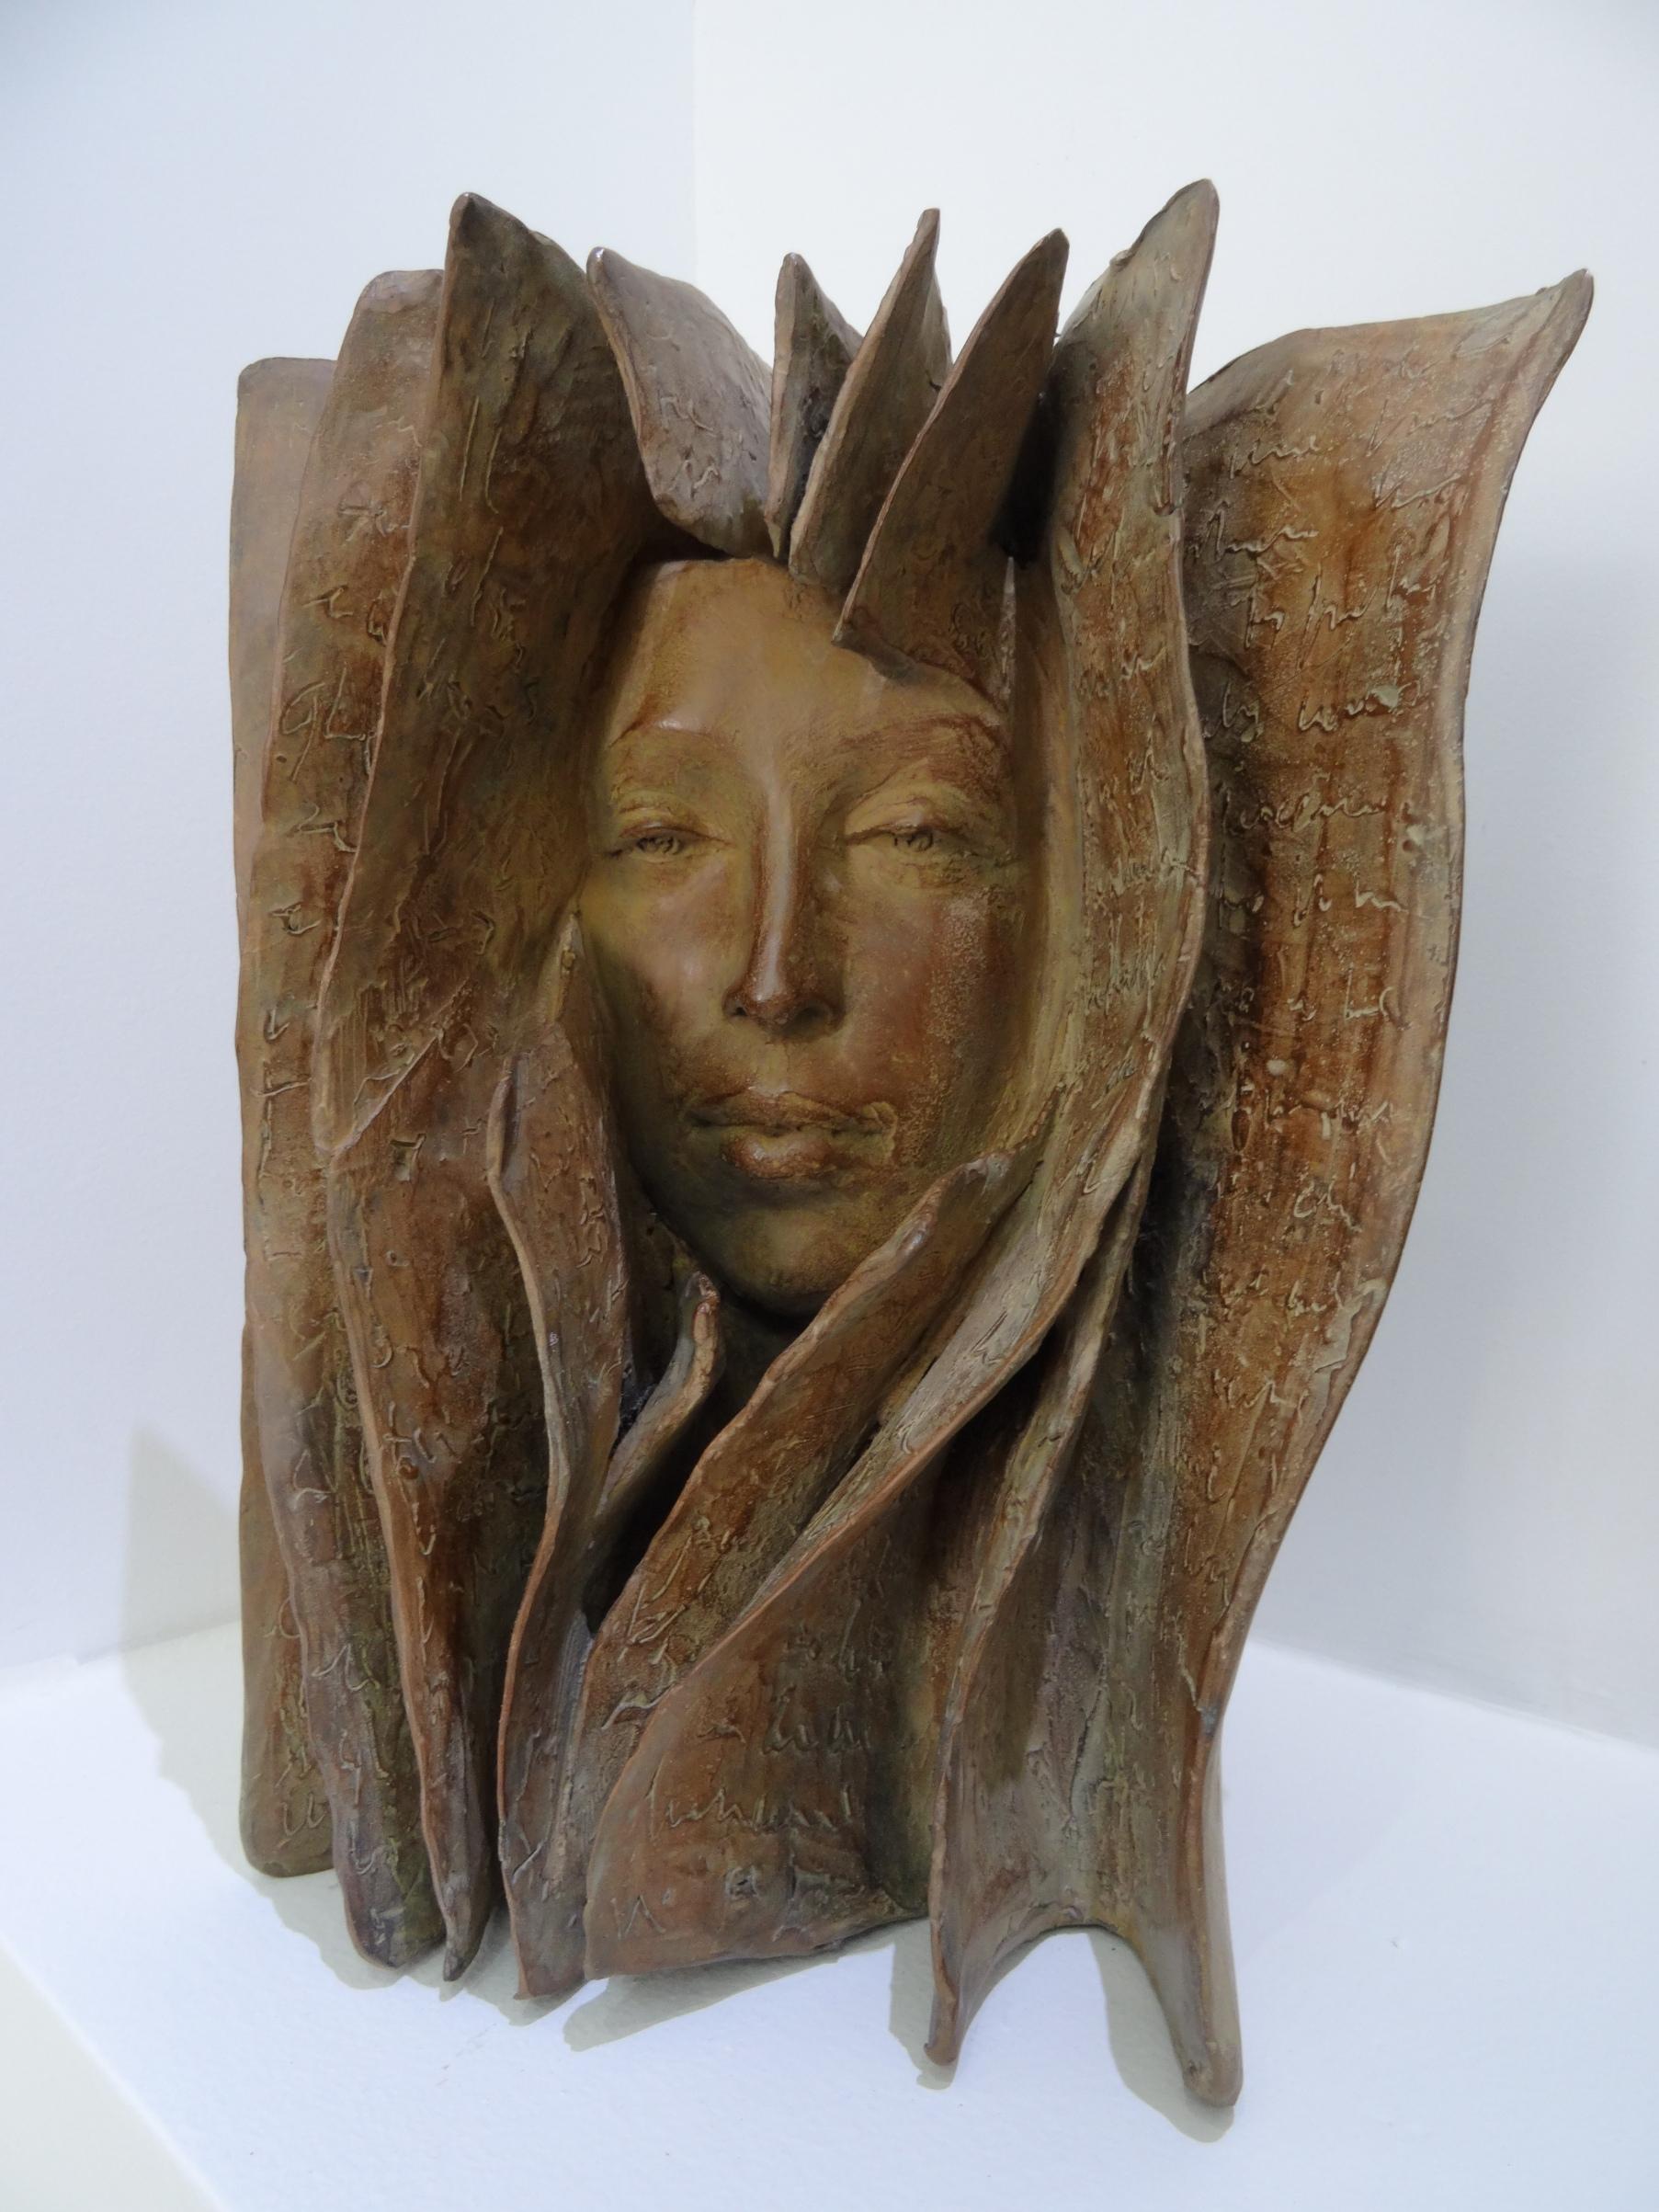 paola grizi artist sculptures bronze books price for sale honfleur